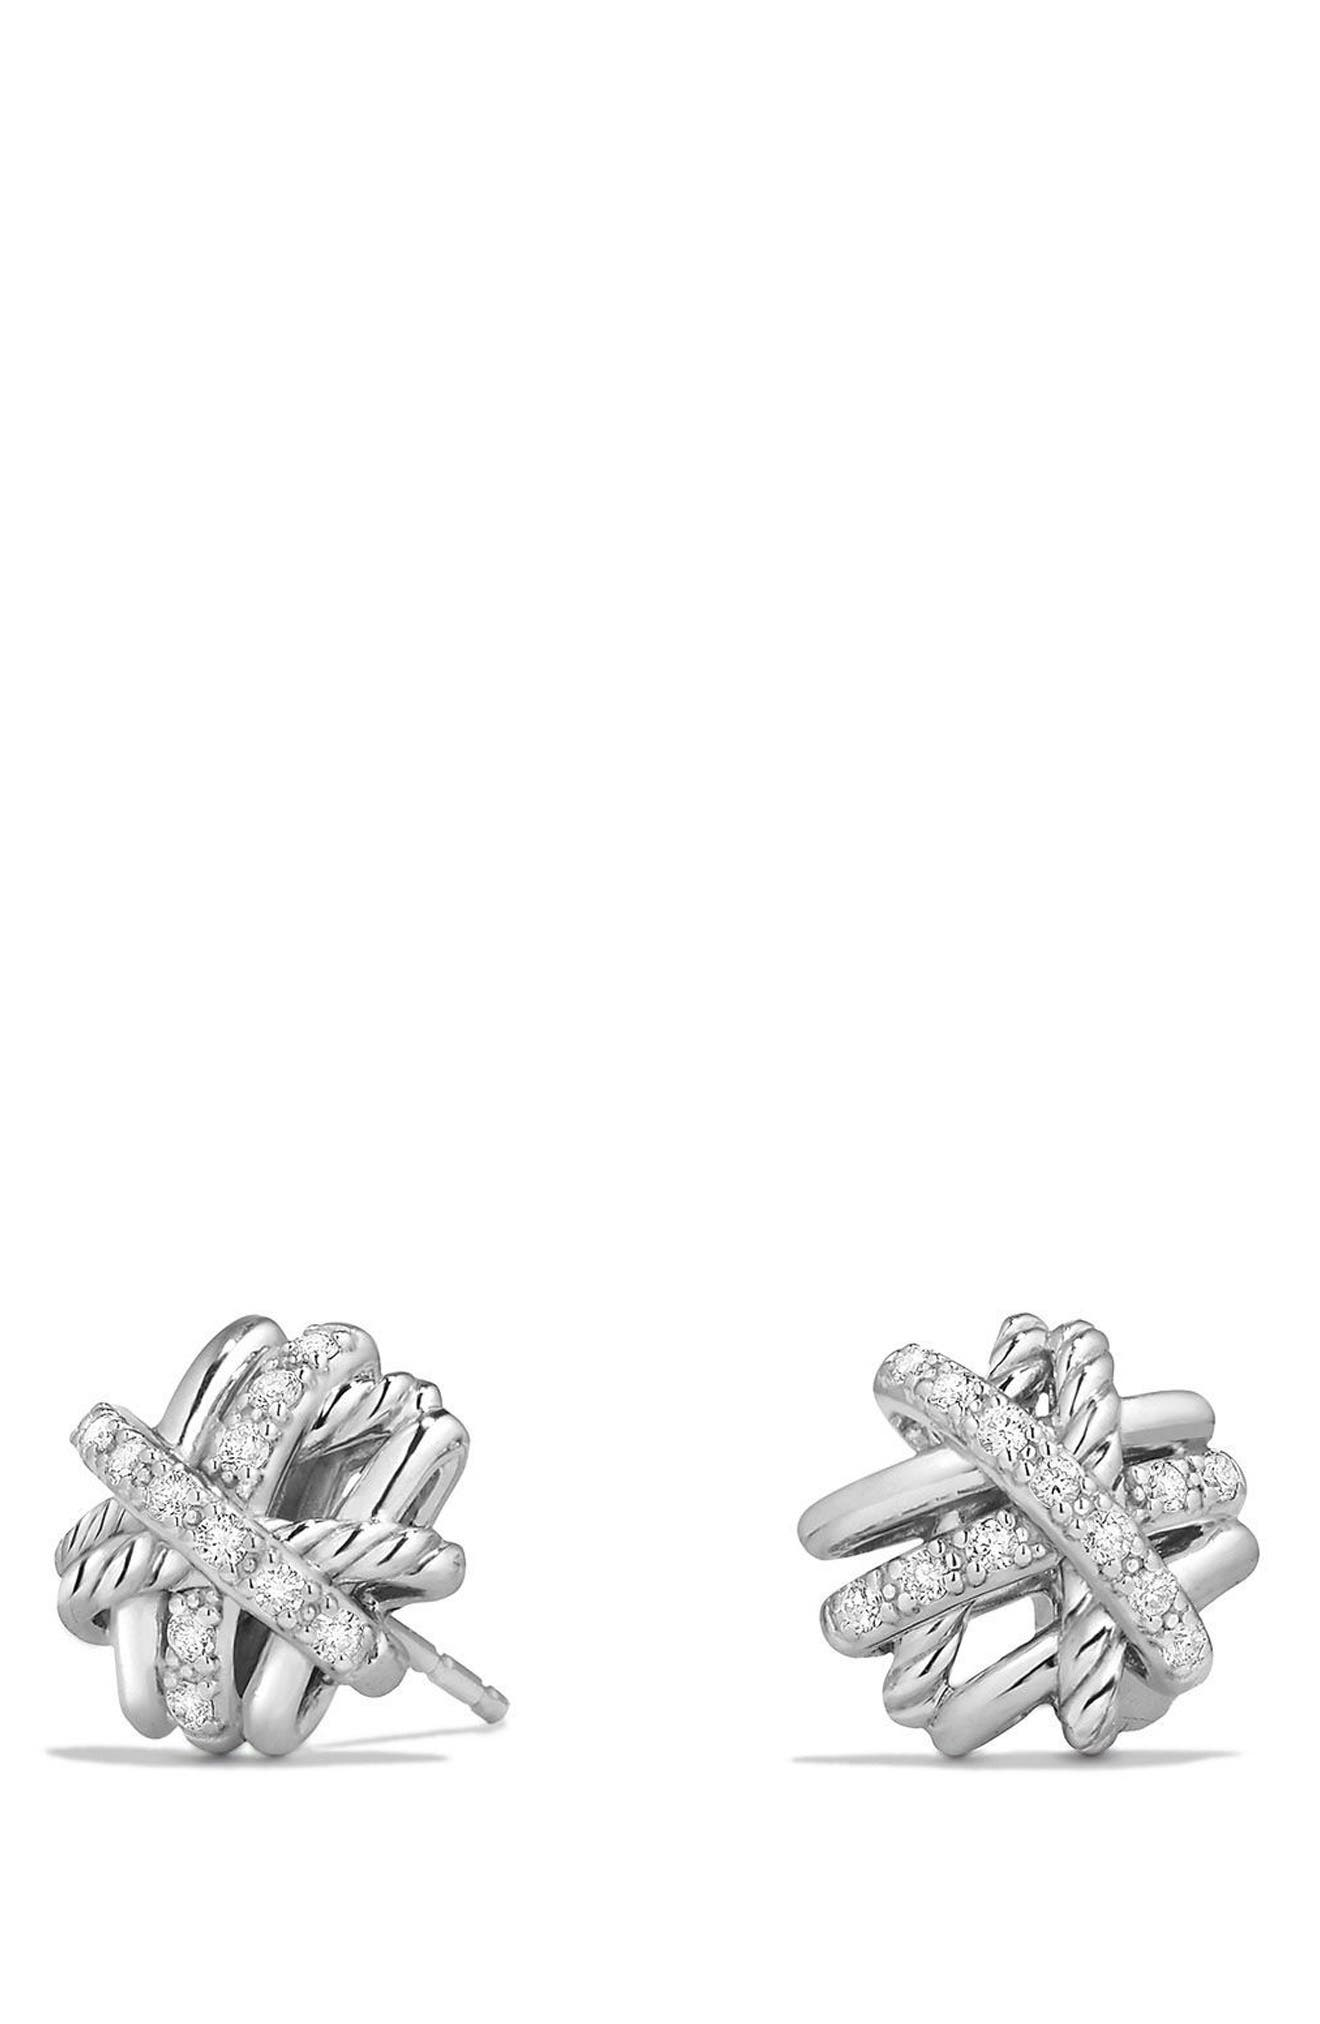 Main Image - David Yurman Crossover Stud Earrings with Diamonds